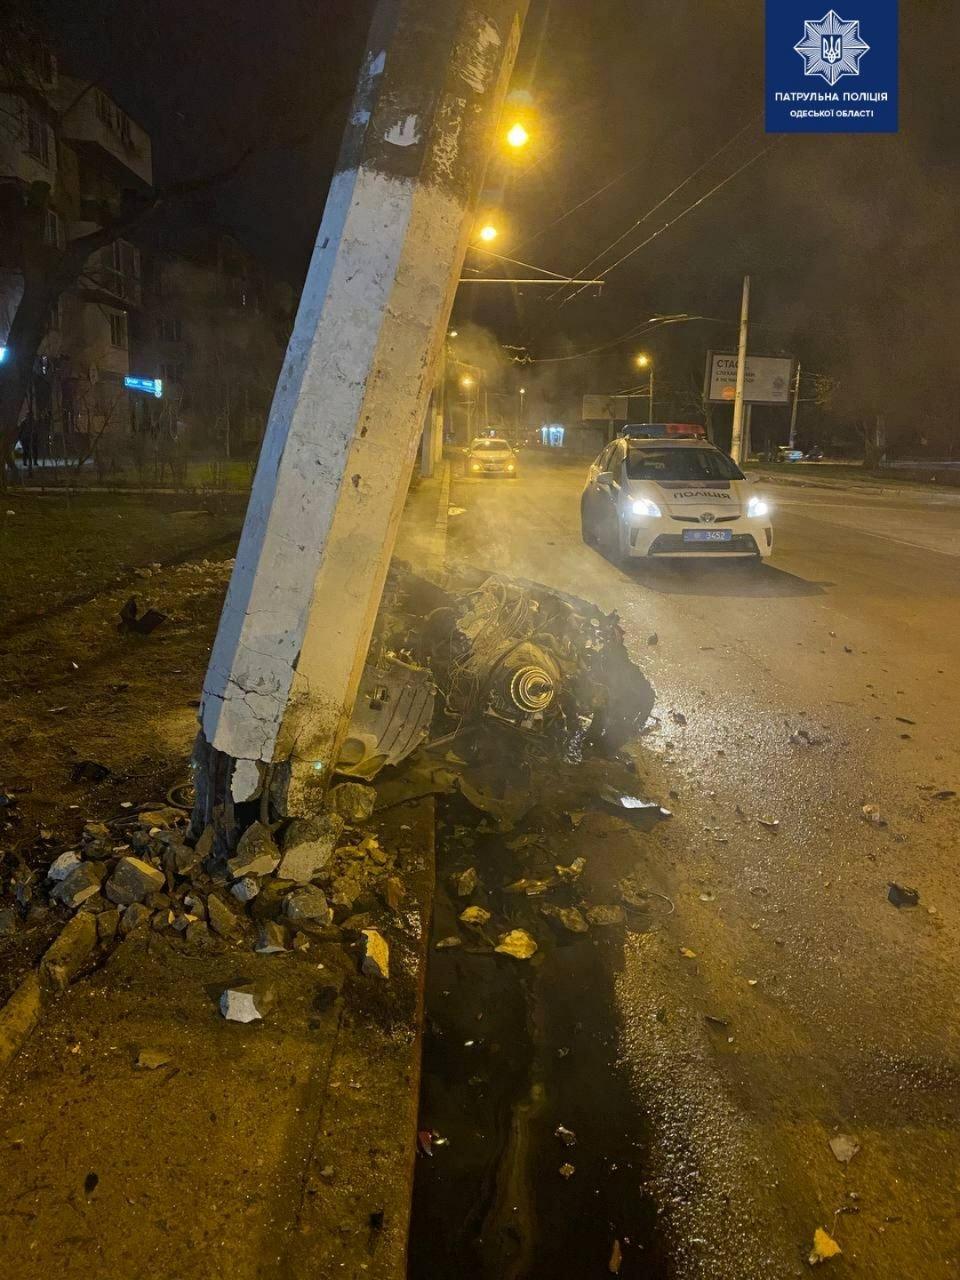 Жесткое ДТП в Одессе: от удара взорвался автомобиль, ФОТО, фото-2